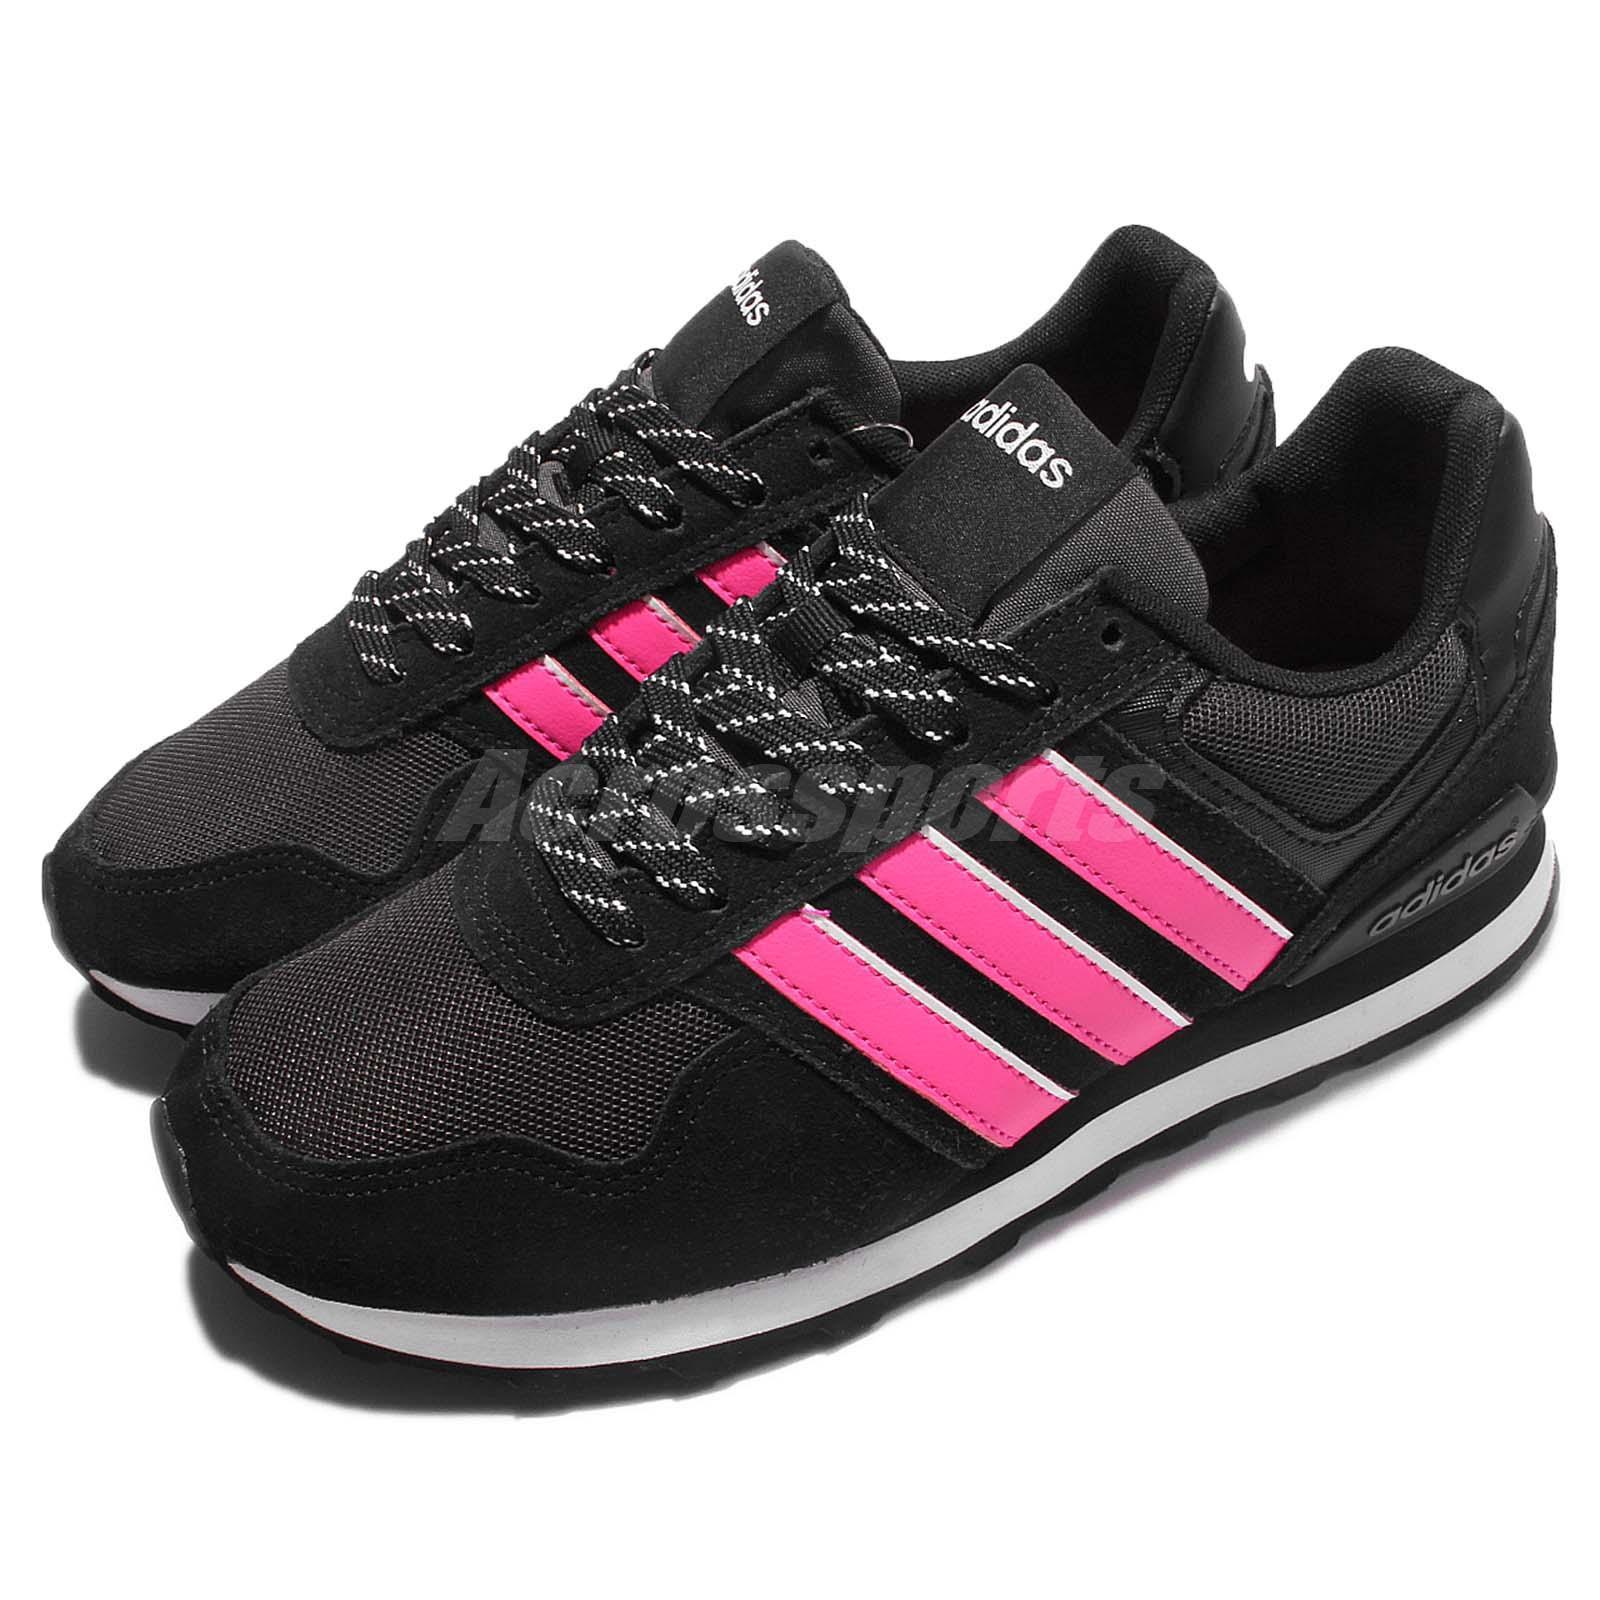 adidas neo label 10k w black pink women classic shoes. Black Bedroom Furniture Sets. Home Design Ideas